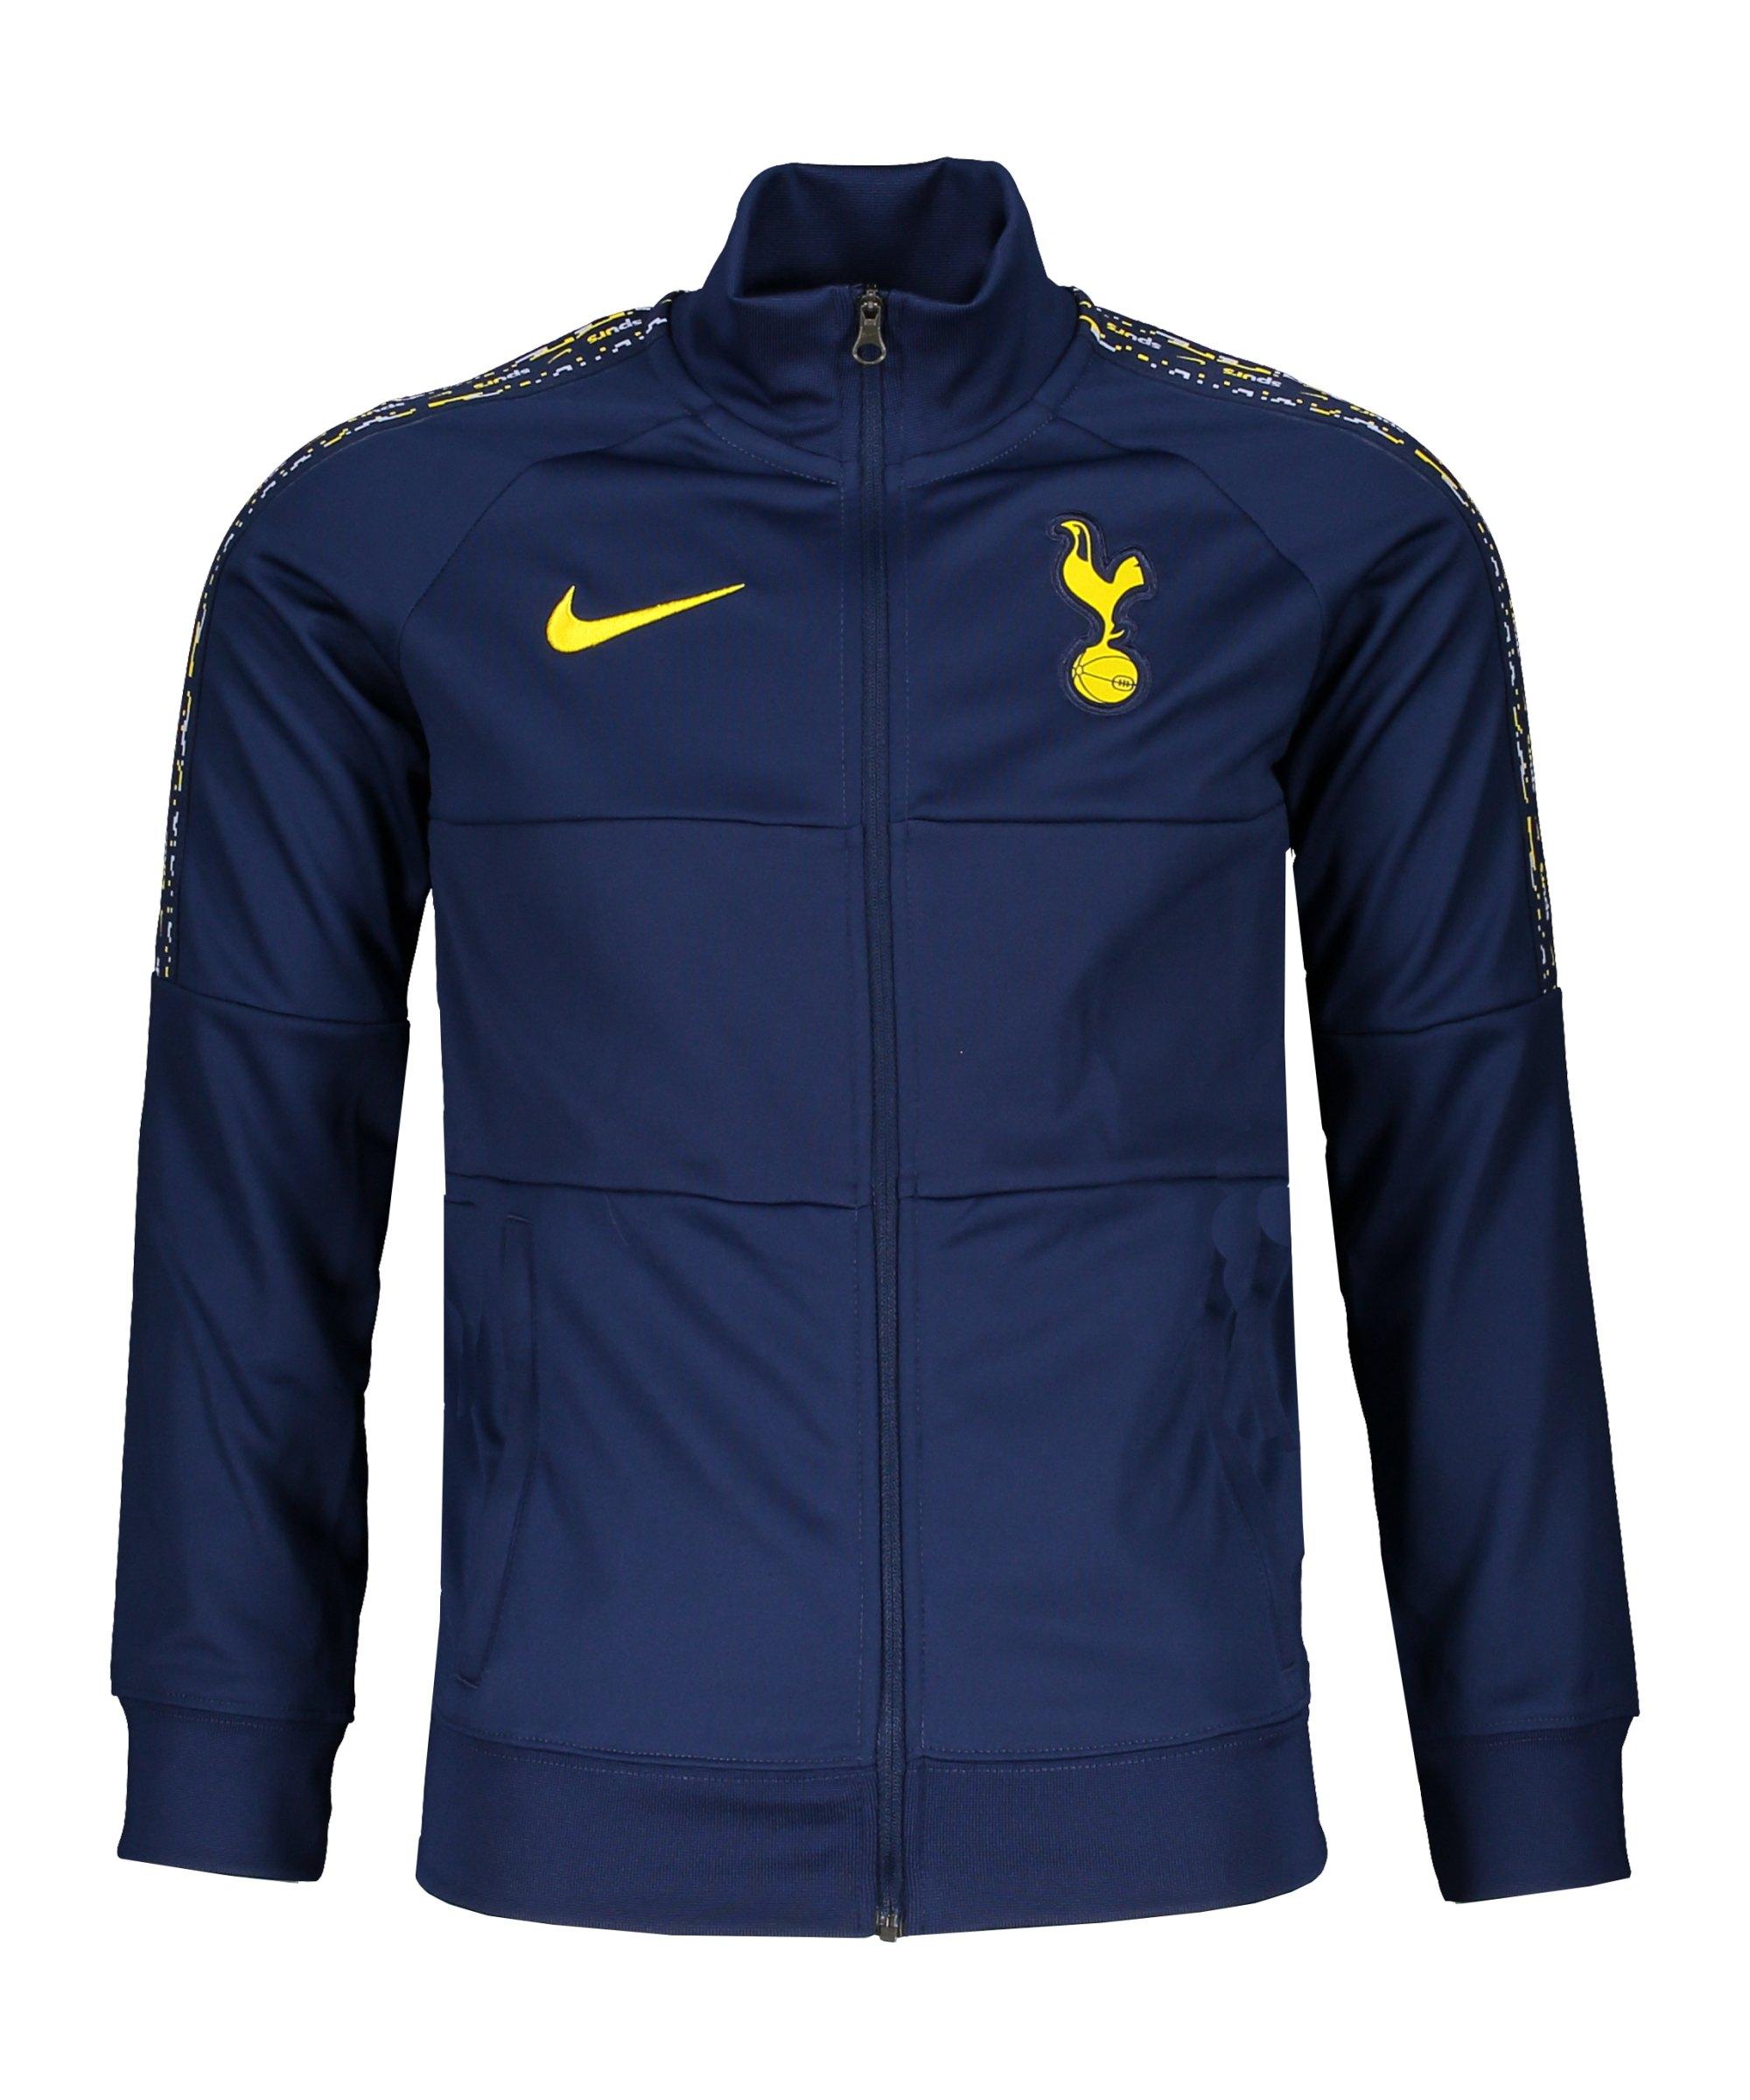 Nike Tottenham Hotspur I96 Anthem Jacke CL Kids Blau F429 - blau